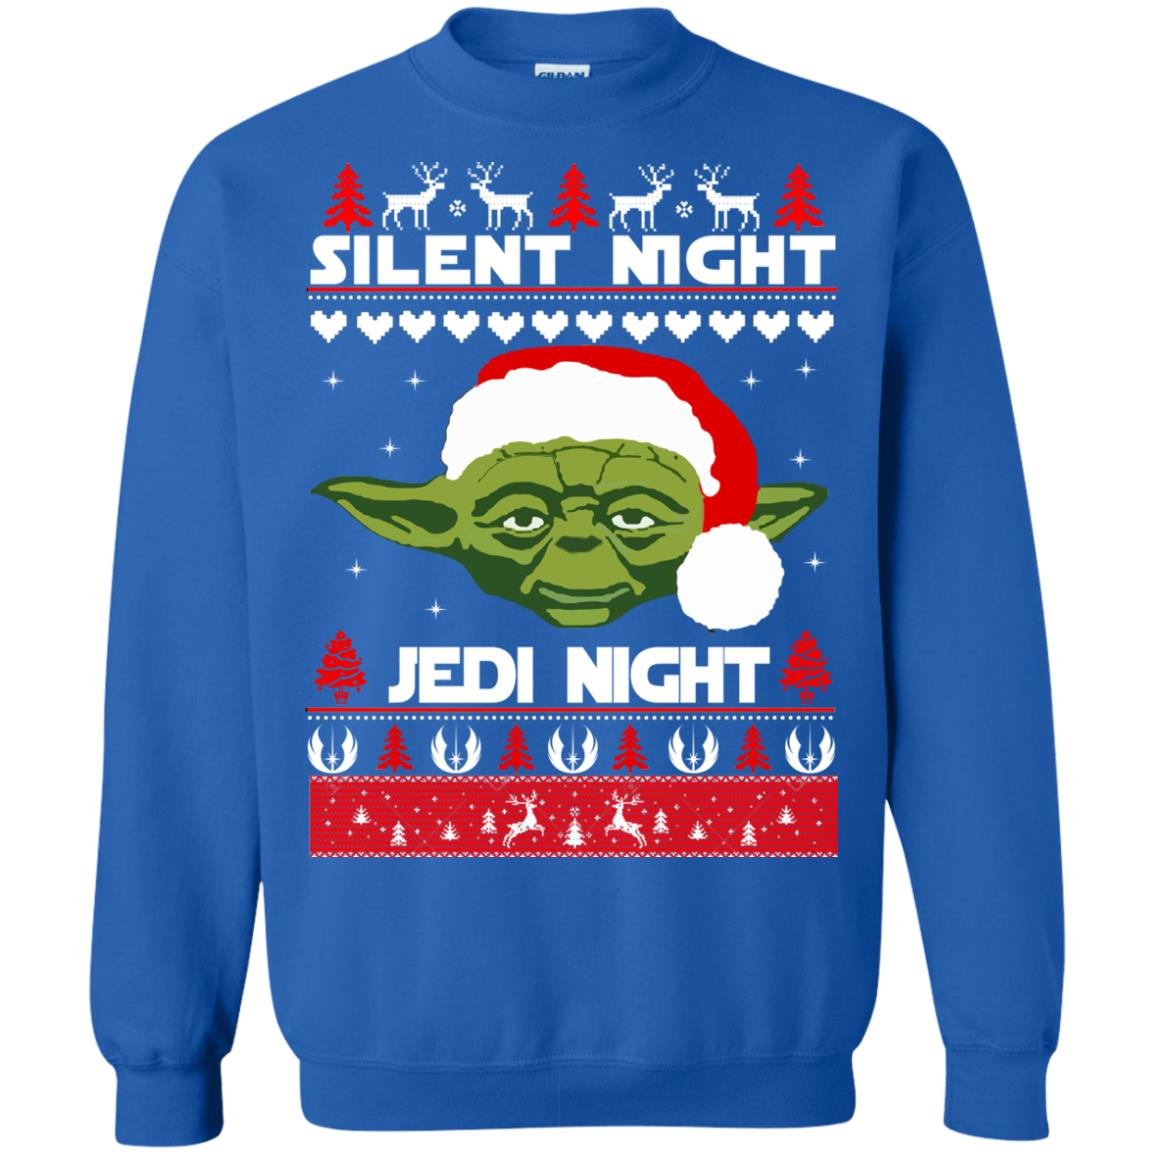 image 1720 - Yoda Star Wars: Silent Night Jedi Night Christmas Sweater, Hoodie